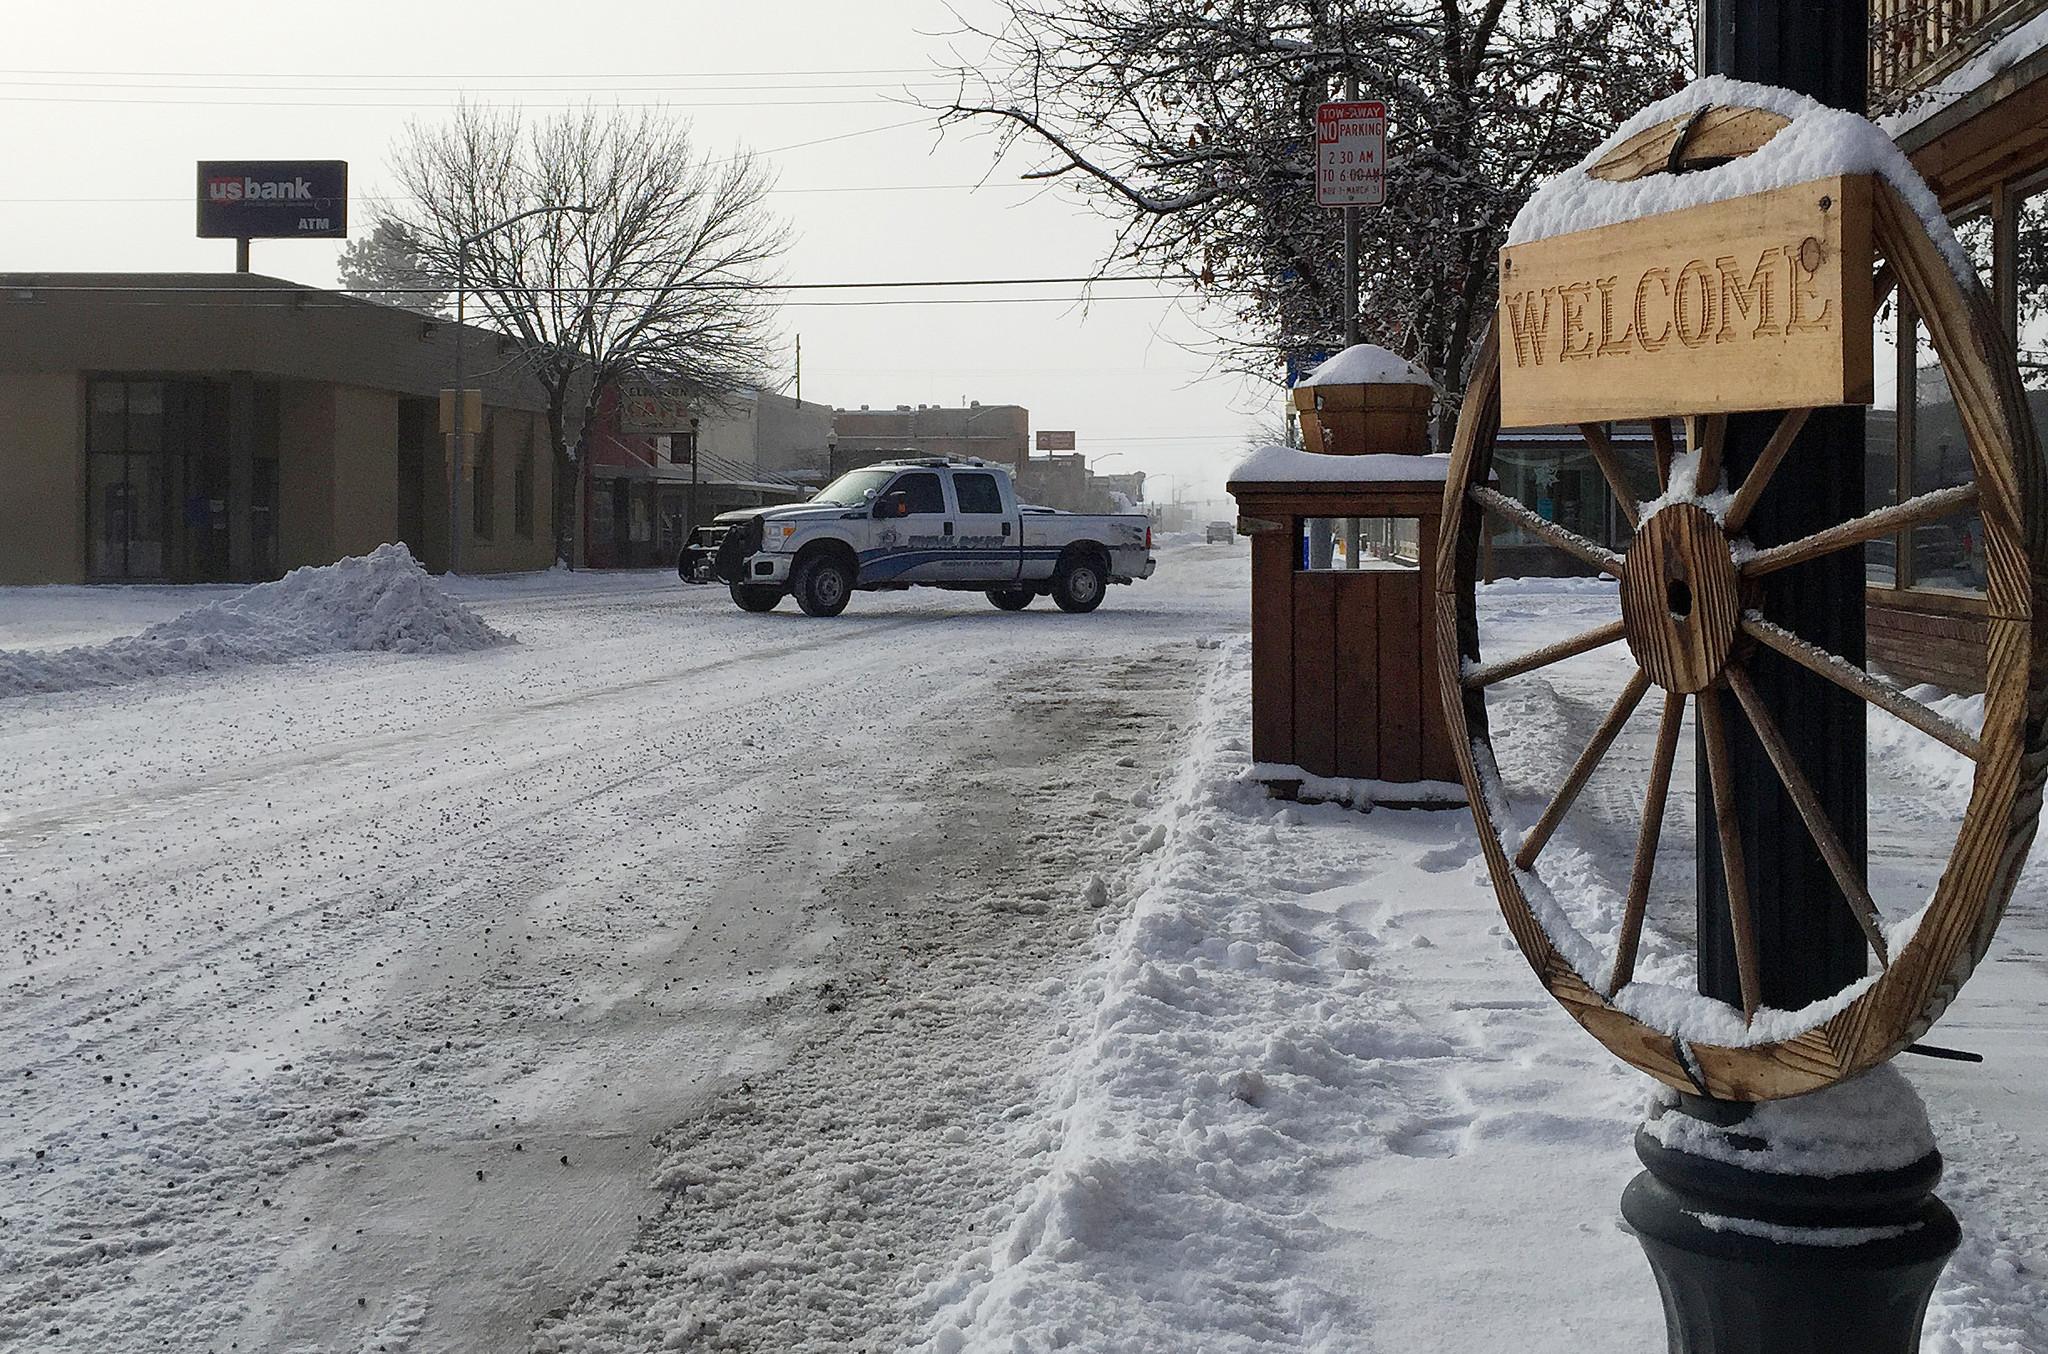 Man arrested in government vehicle stolen from occupied Oregon refuge - Chicago Tribune